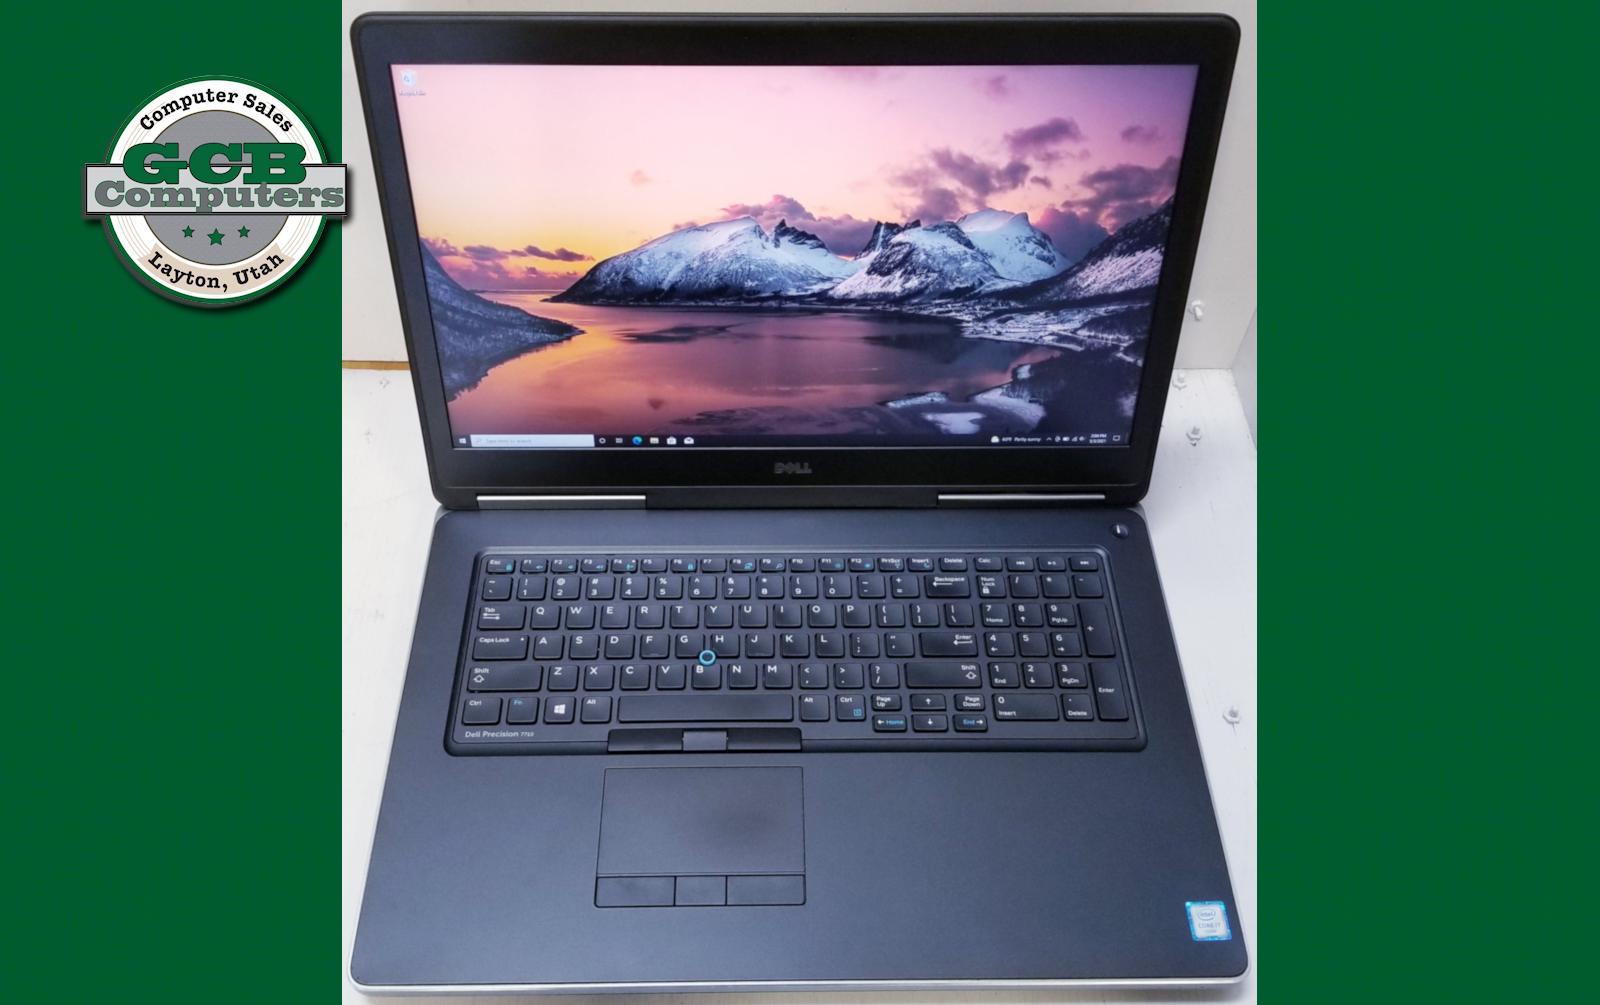 $460 Dell 7710 i7-6820HQ (Quad Core) 256GB SSD 500GB HDD 16GB RAM 1080p R9 M375X